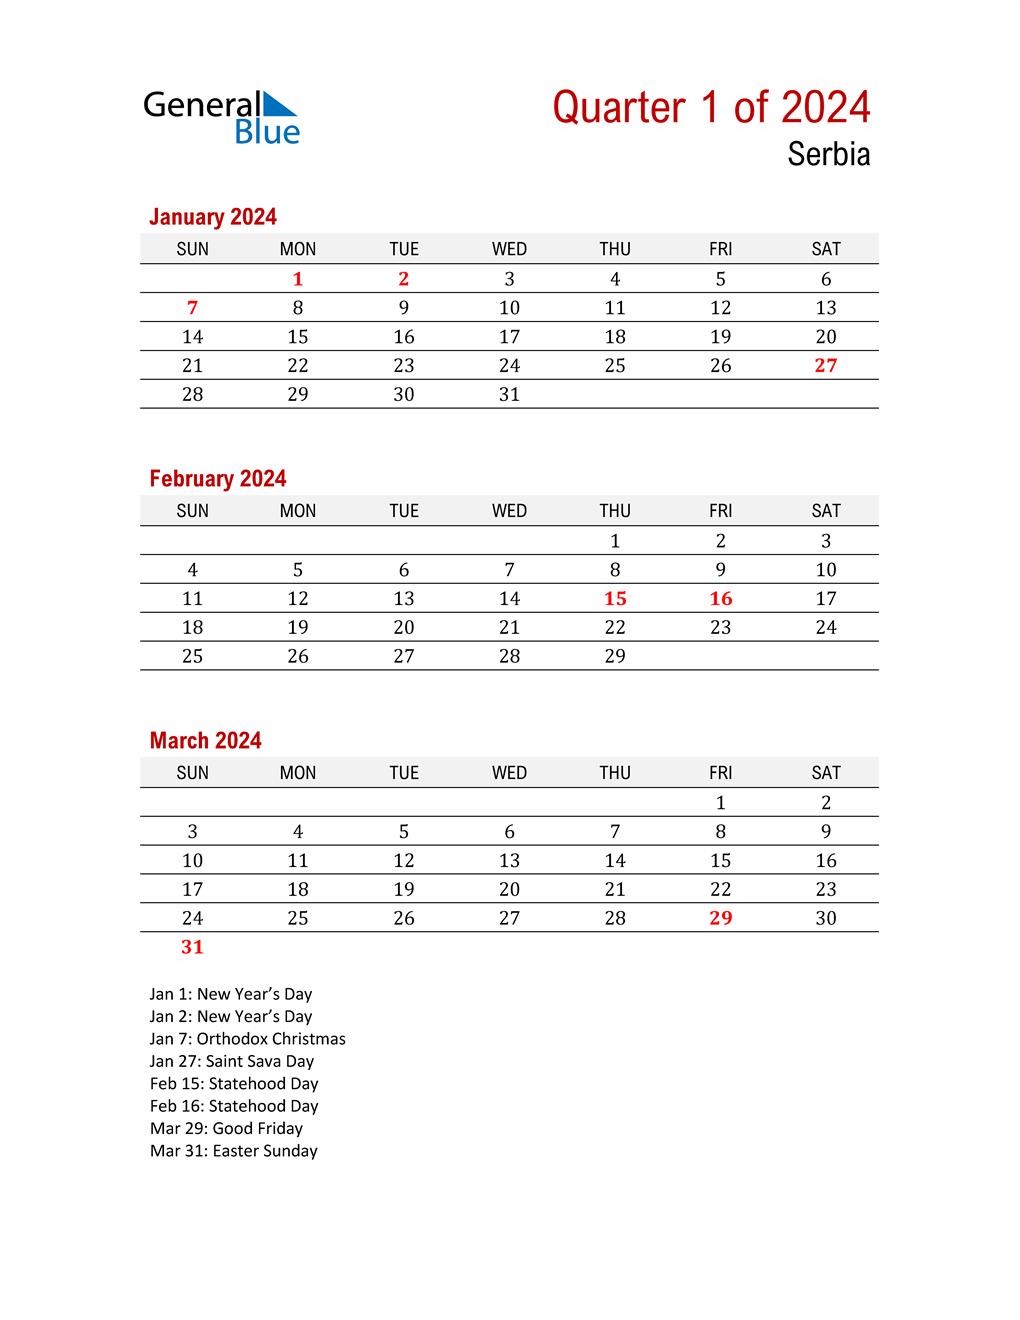 Printable Three Month Calendar for Serbia